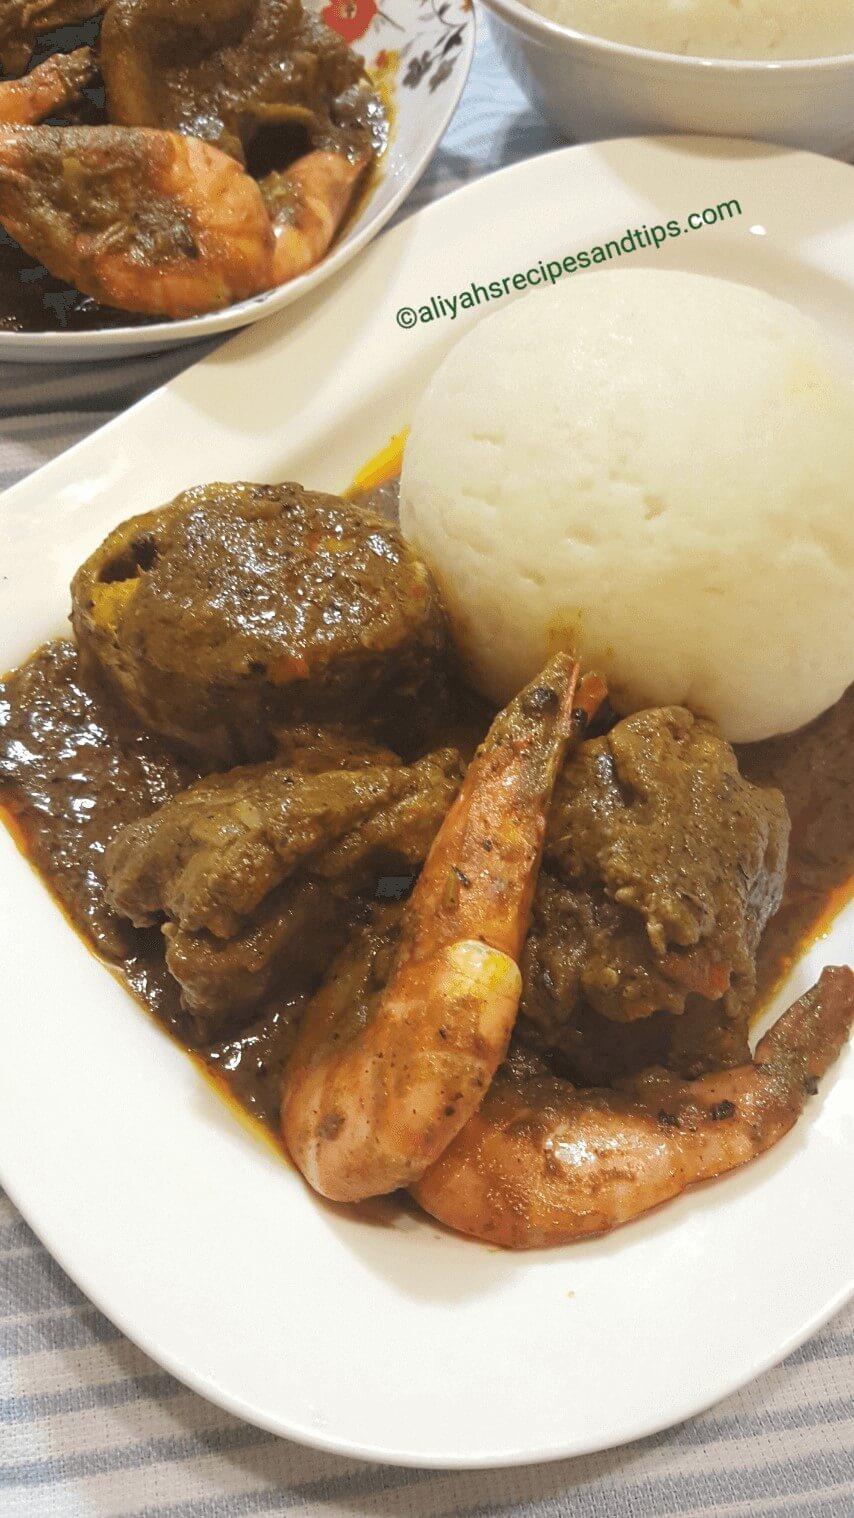 Nigerian soup, soup, Banga soup, Ofe Akwu, Delta soup, Delta Banga Soup, catfish, starch, eba, native, urhobo, fresh fish, periwinkle, spice, ingredients, recipe, Nigerian banga soup, edo, poundo